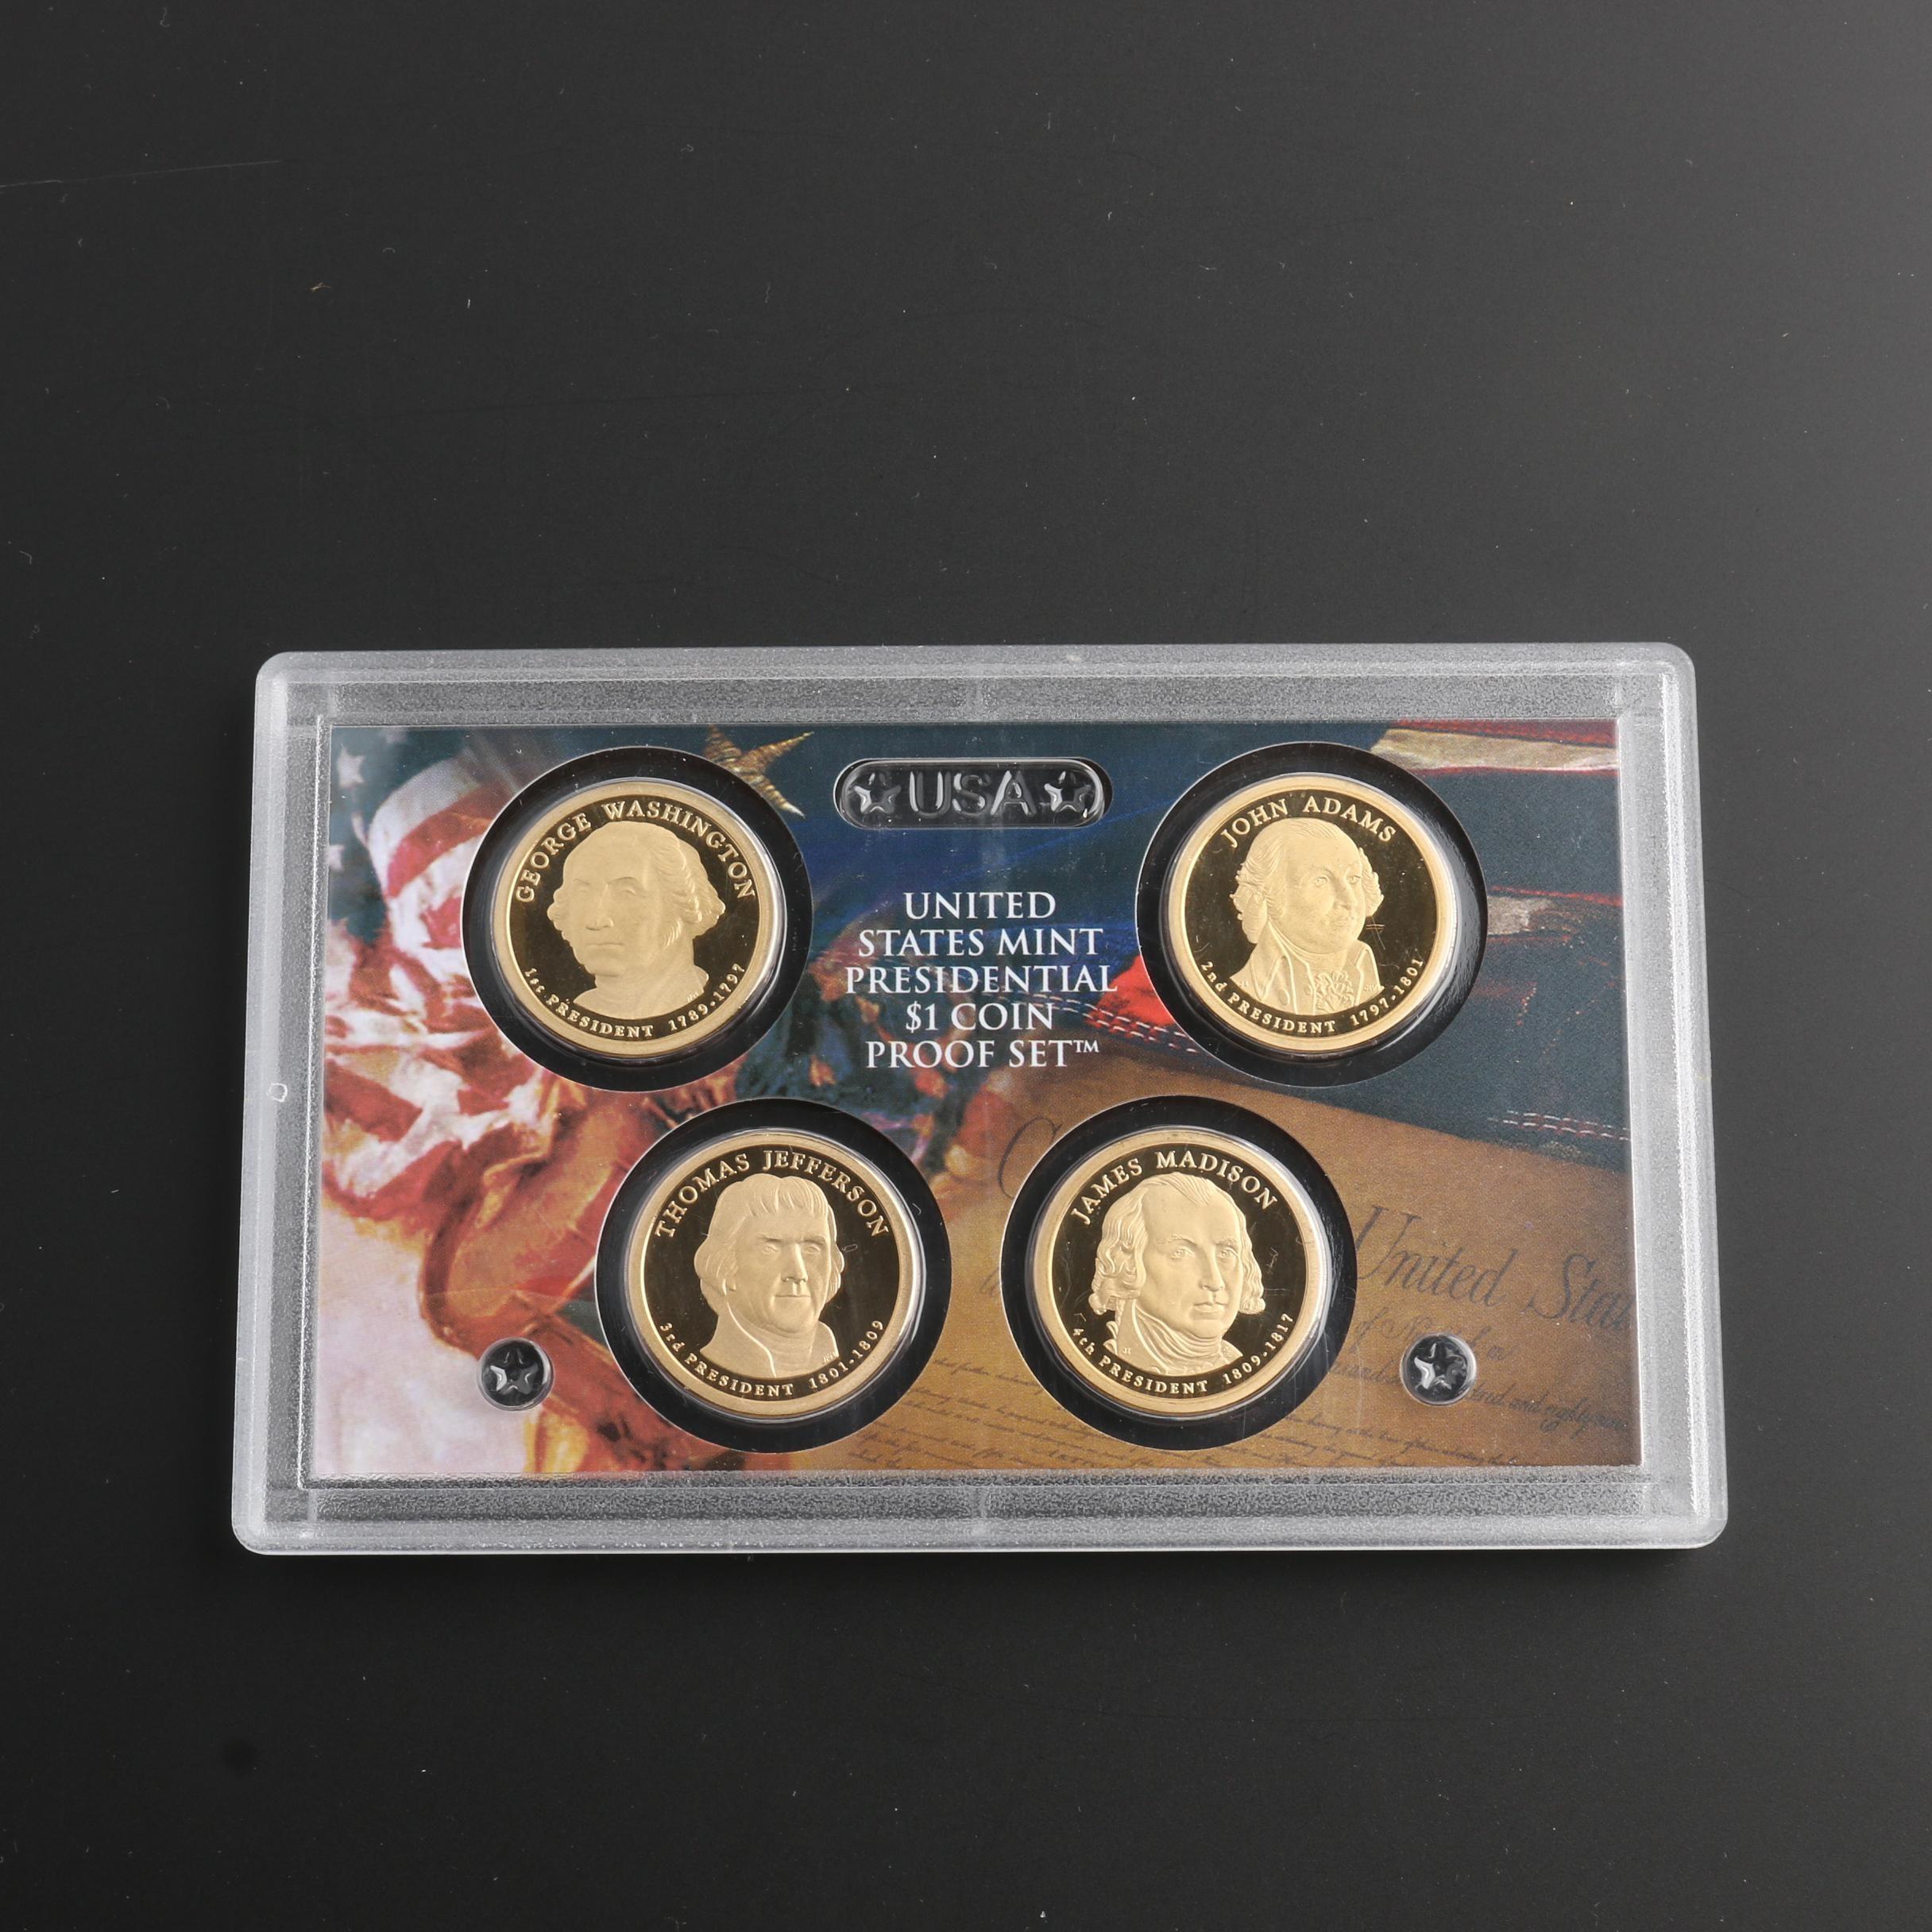 U.S. Mint 2007 Presidential Dollar Proof Set